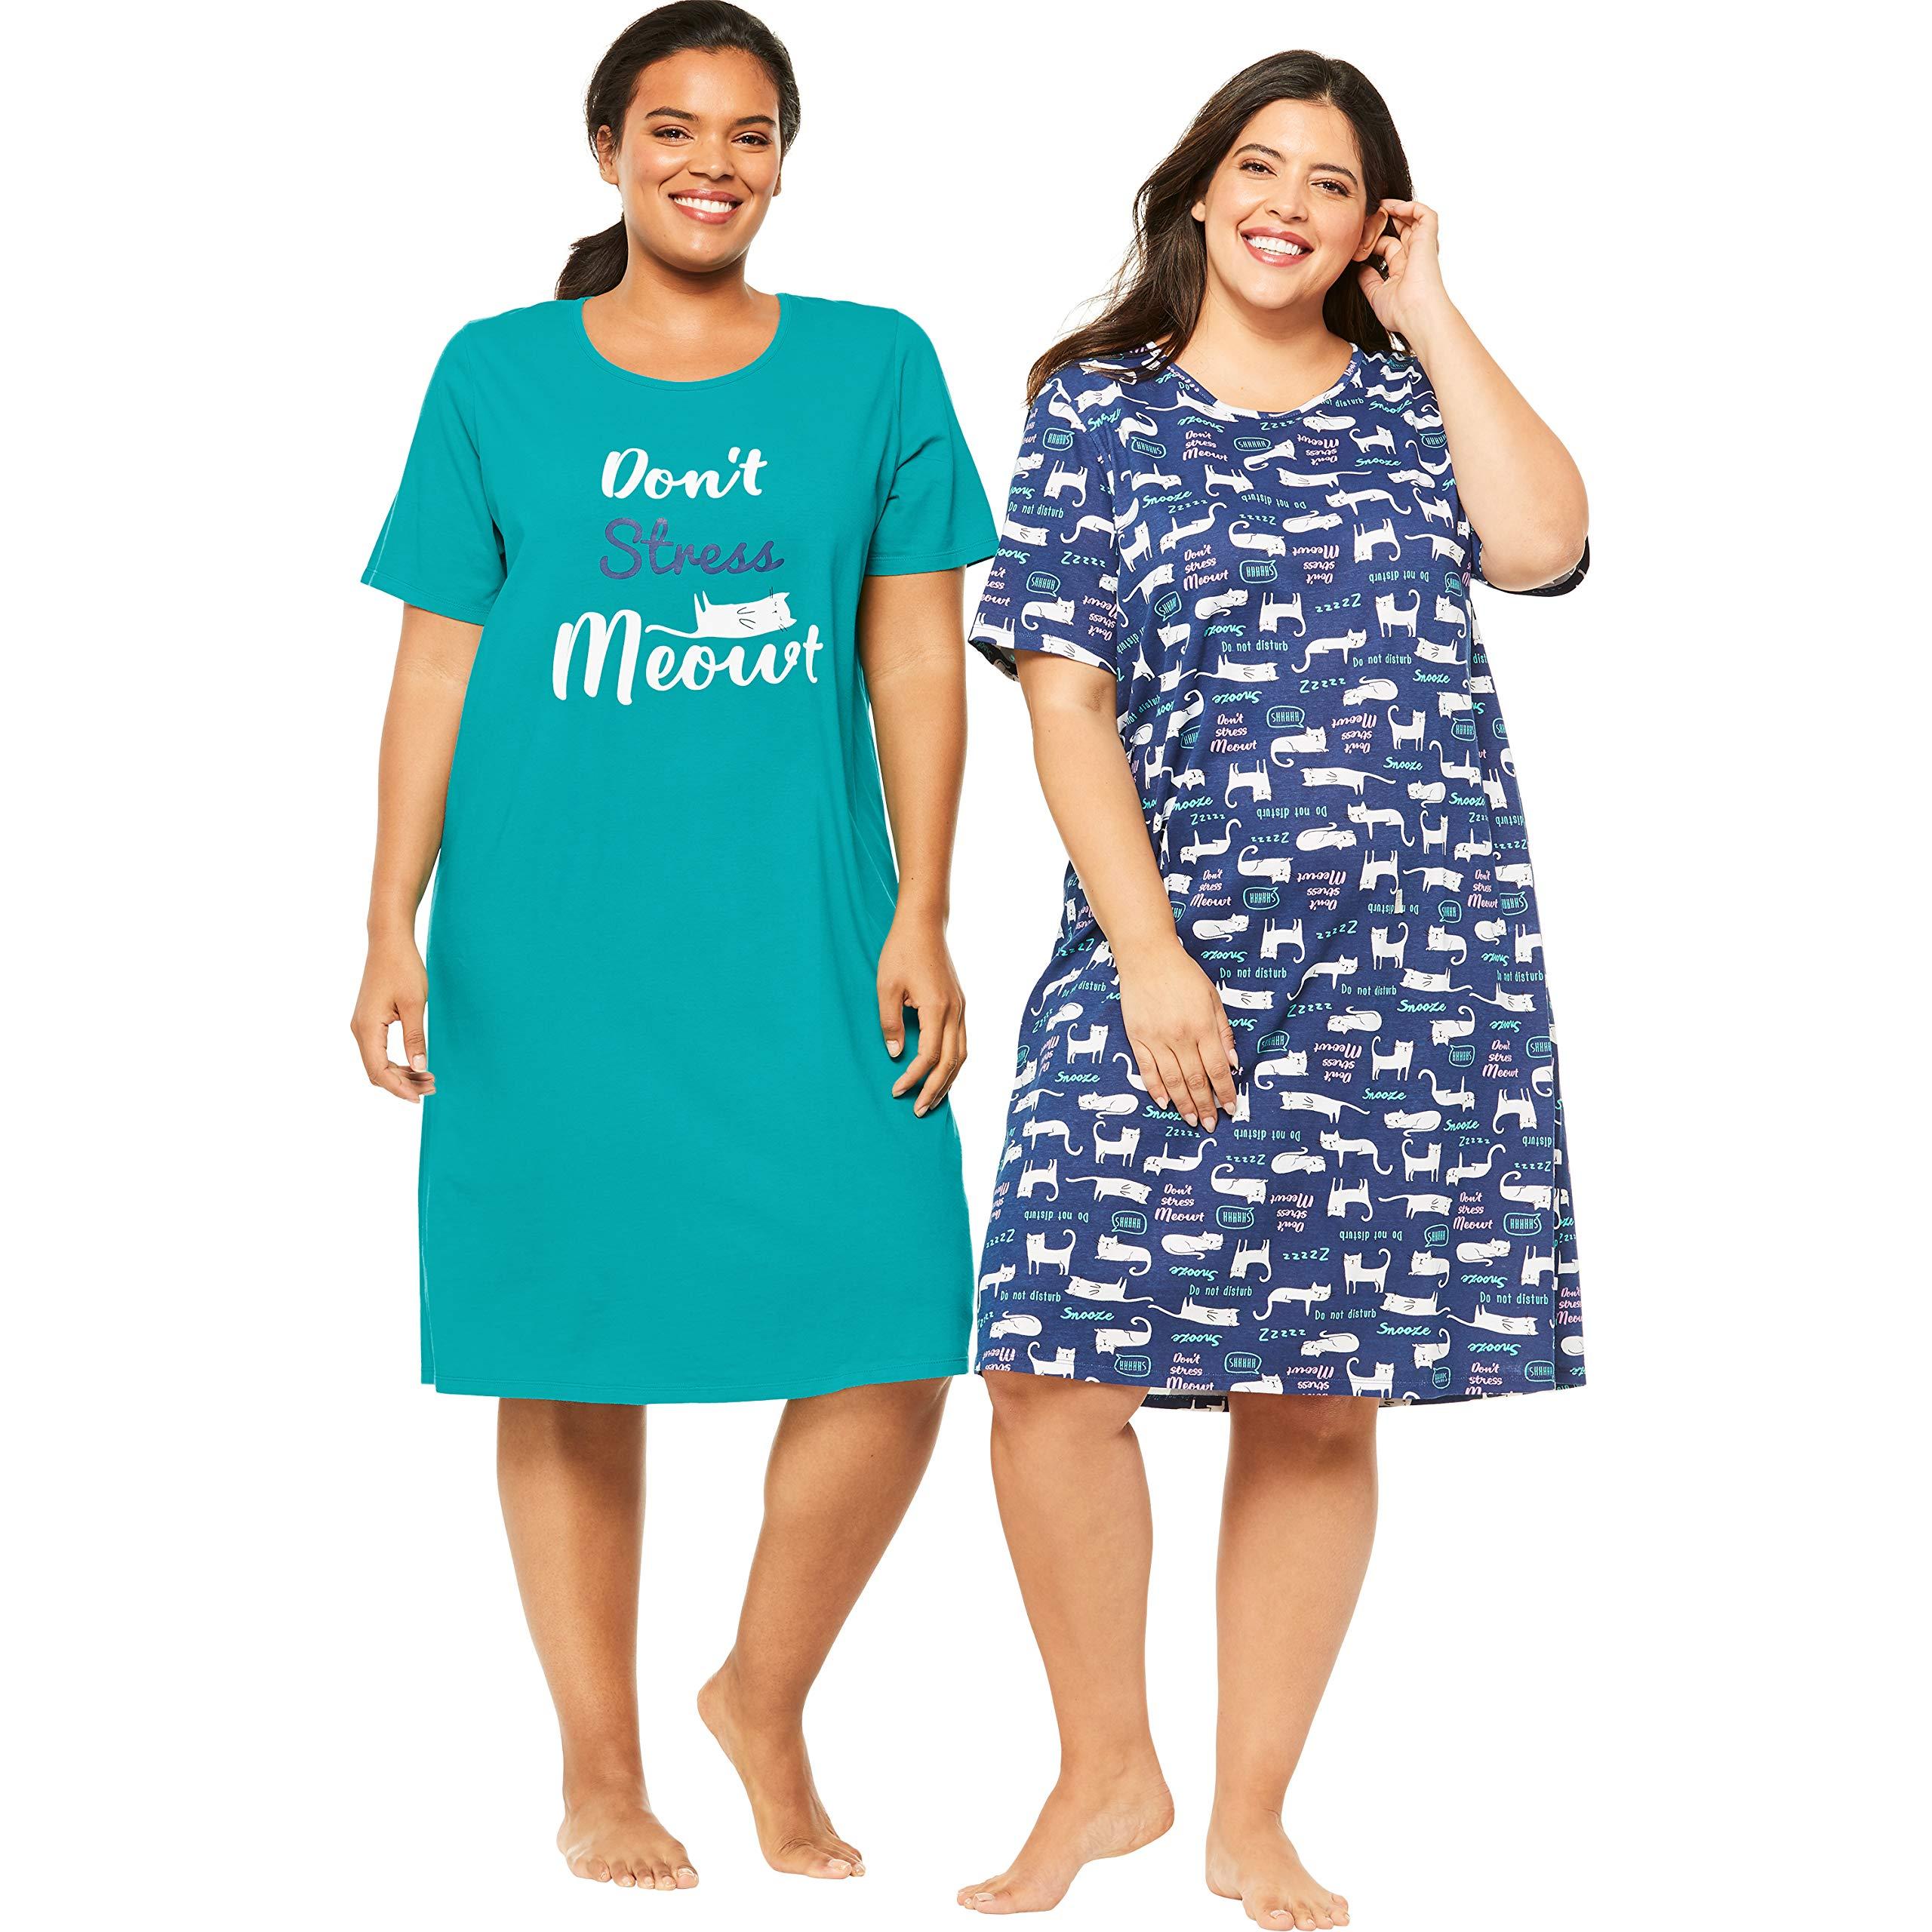 Dreams & Co. Women's Plus Size 2-Pack Short-Sleeve Sleepshirt - Waterfall Meow, 3X/4X by Dreams & Co.